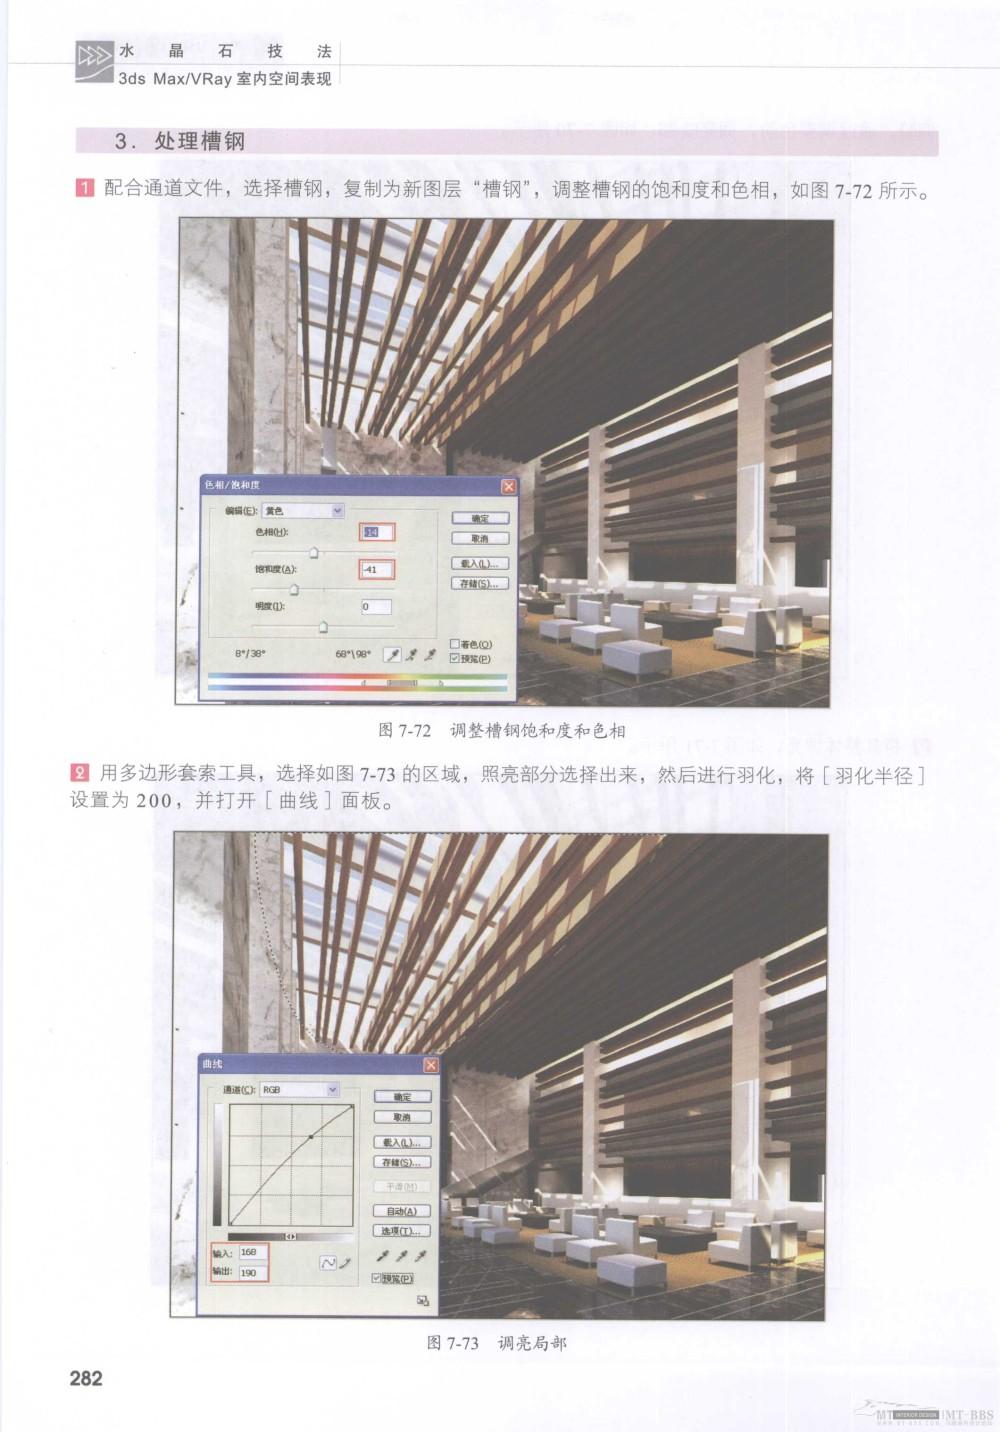 水晶石技法-3ds_Max&VRay室内空间表现_水晶石技法-3ds_Max&VRay室内空间表现_页面_288.jpg